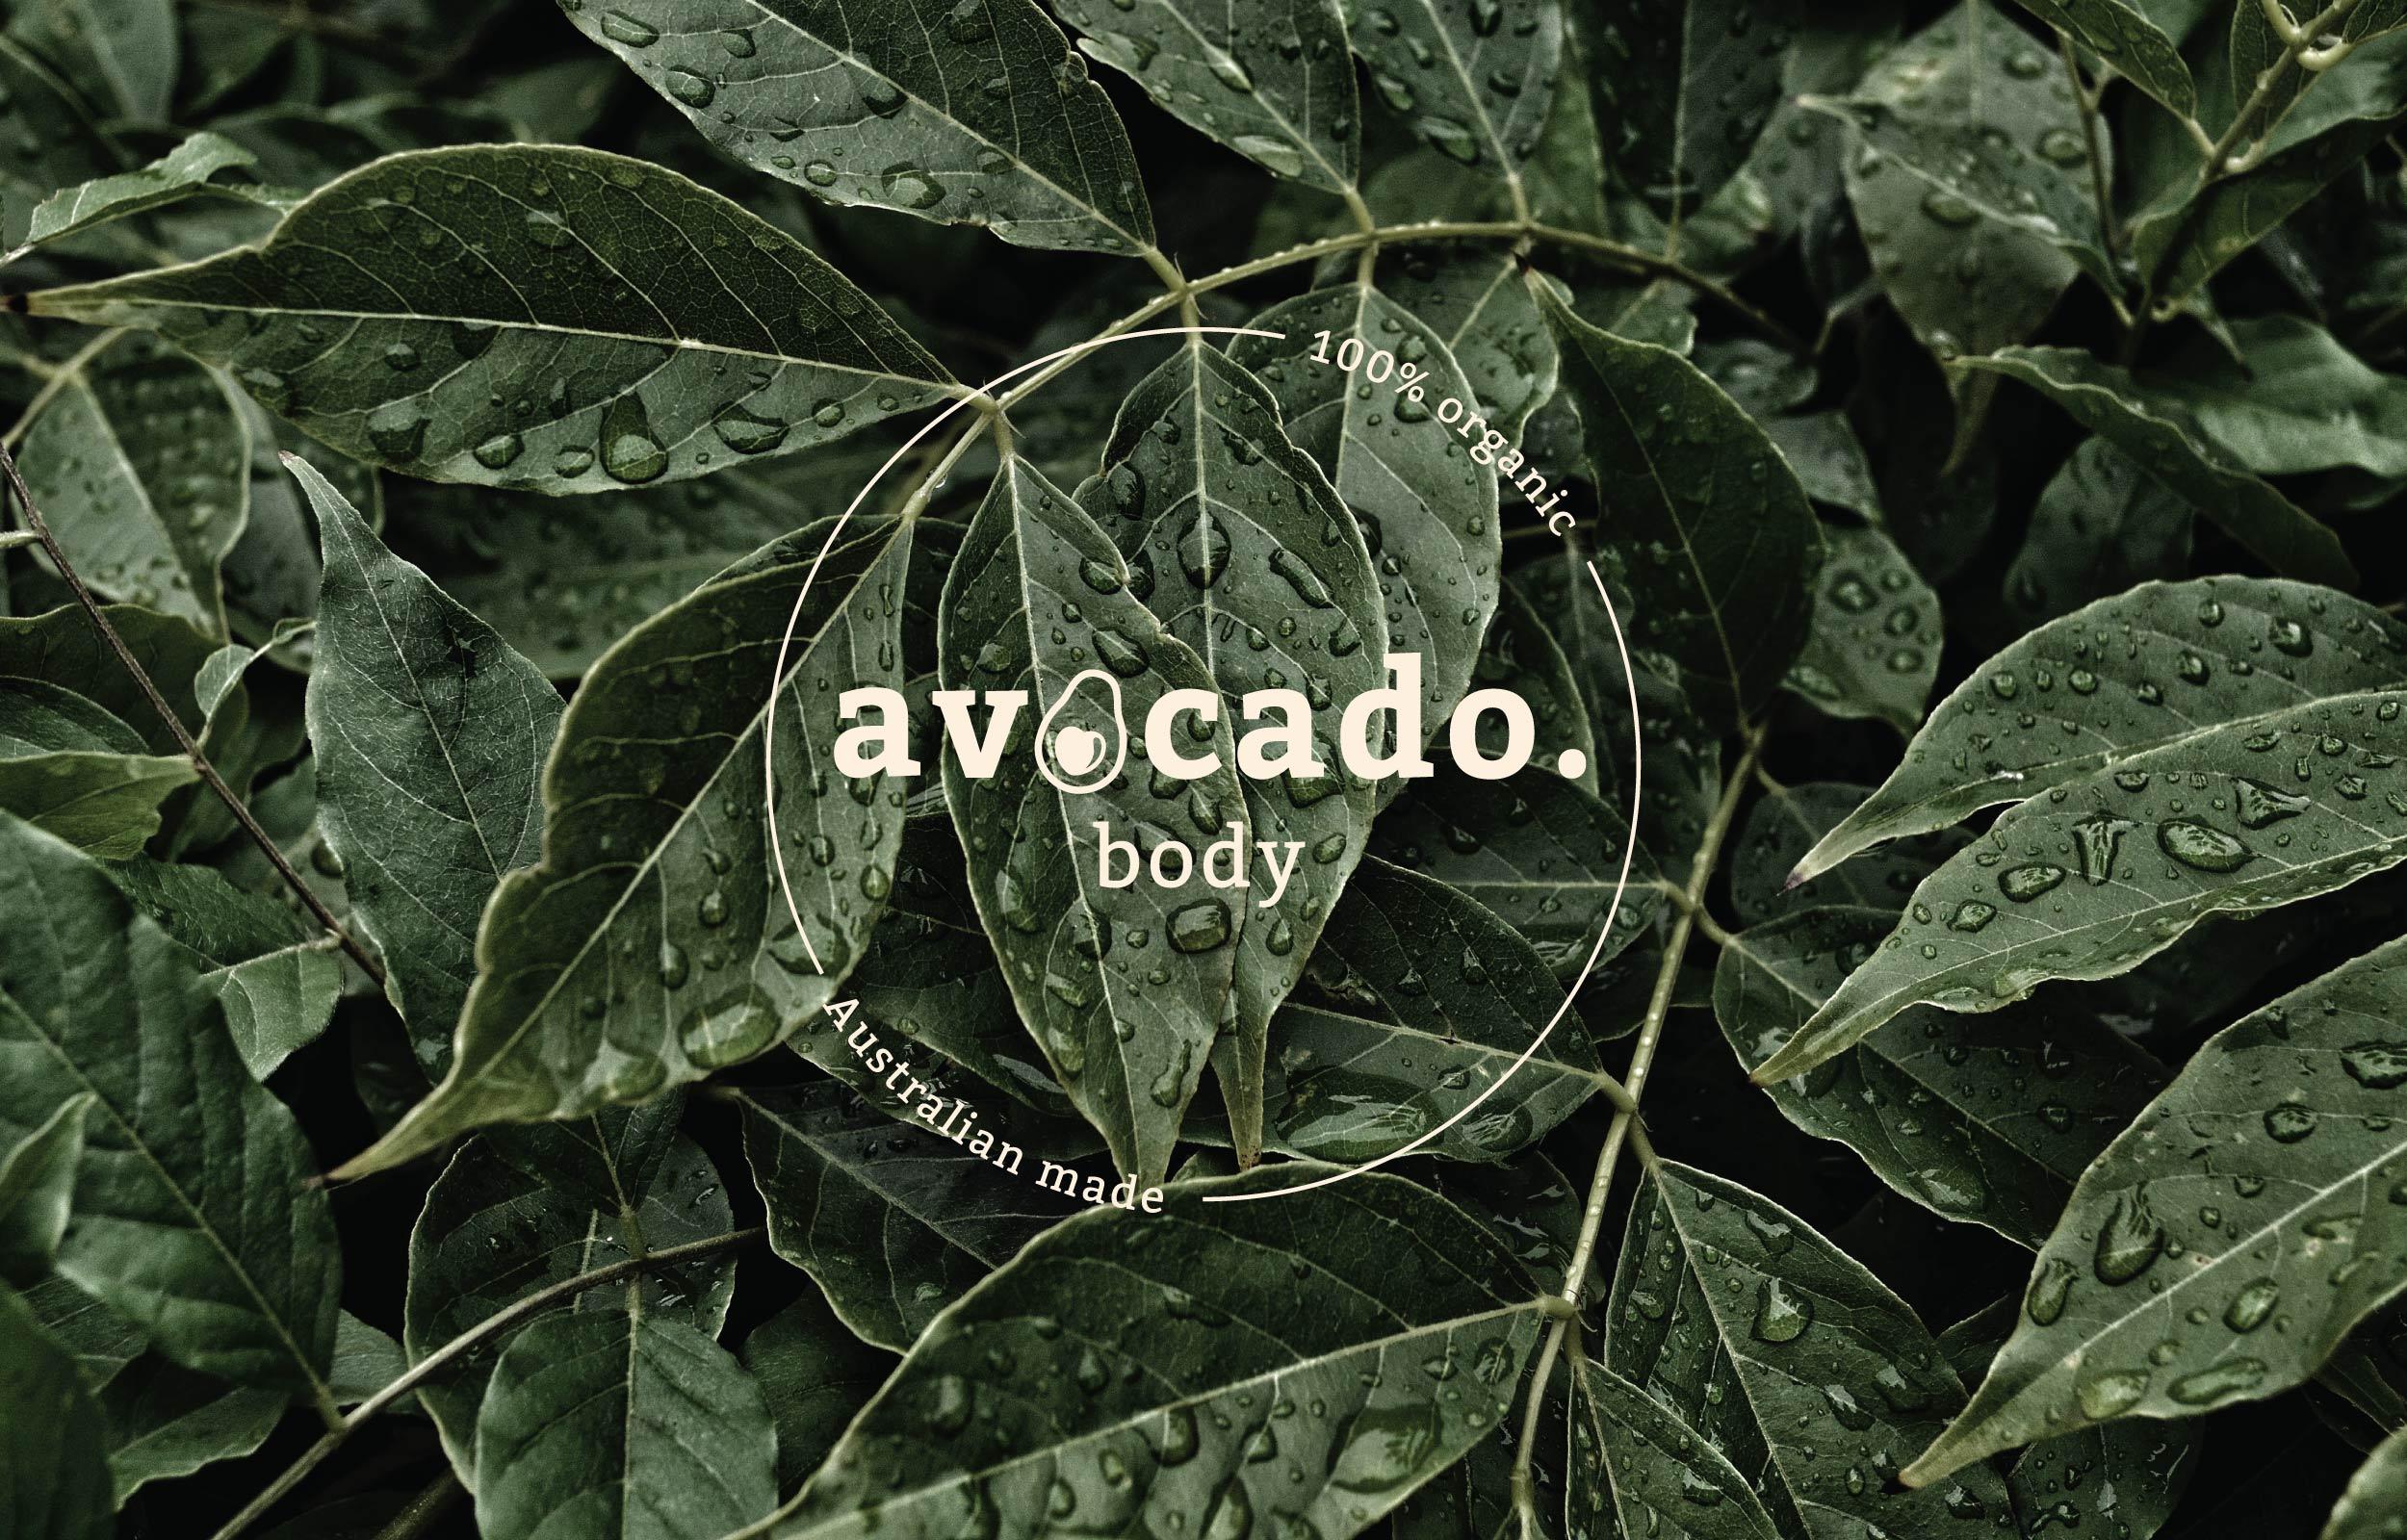 avocado-body-scrub-banner-2.jpg